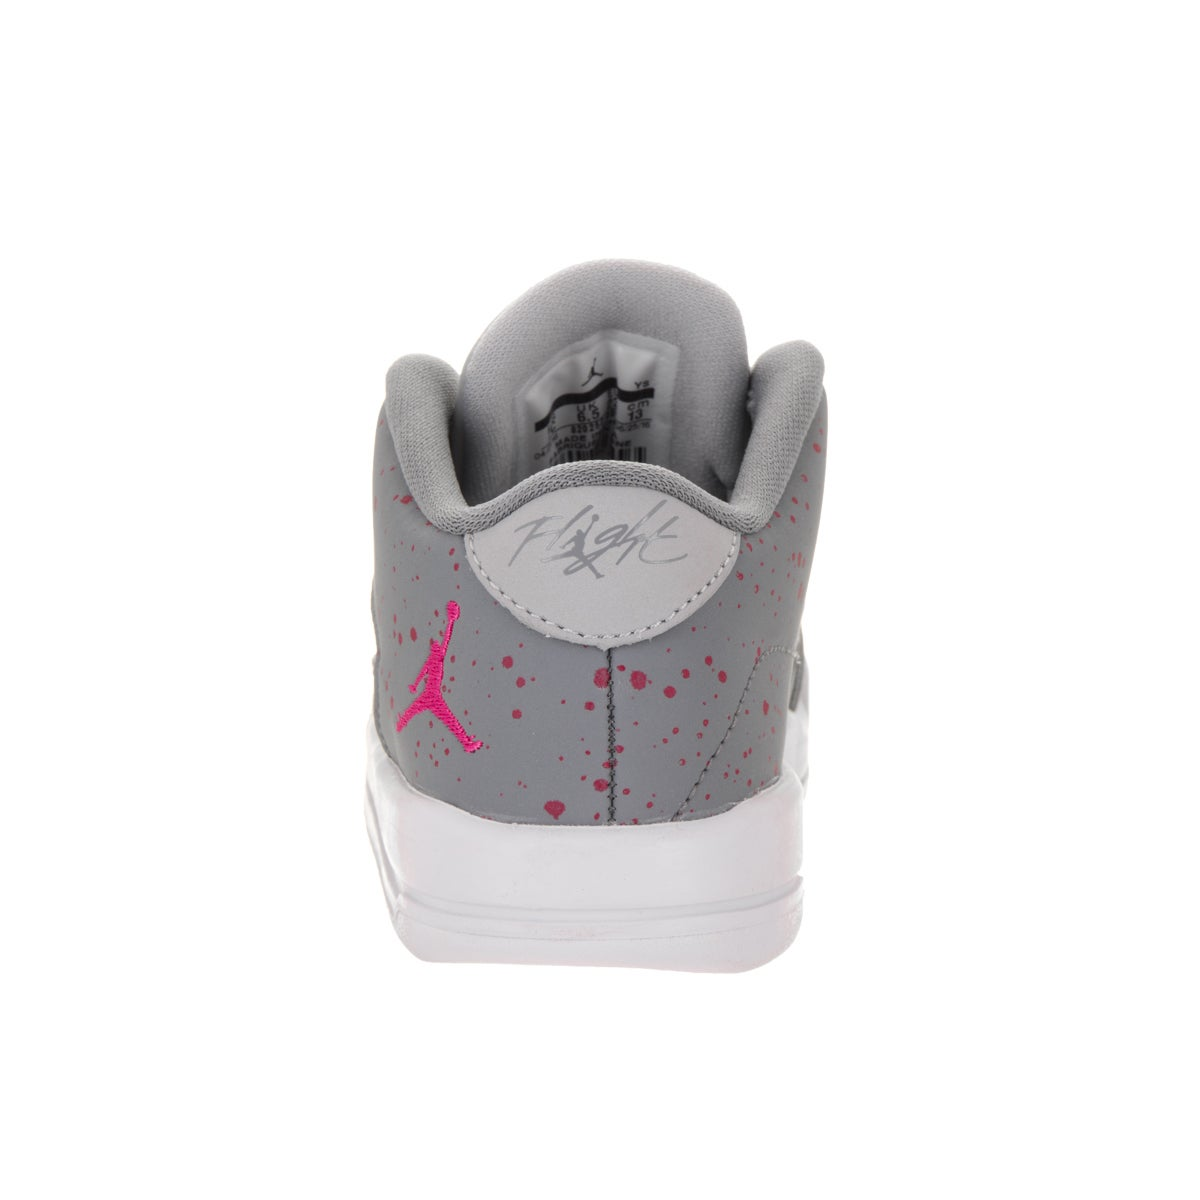 lowest price 13f85 734d5 Shop Nike Jordan Toddlers Jordan Flight Origin 3 Gt Grey Nubuck Basketball  Shoes - Free Shipping Today - Overstock - 14442884